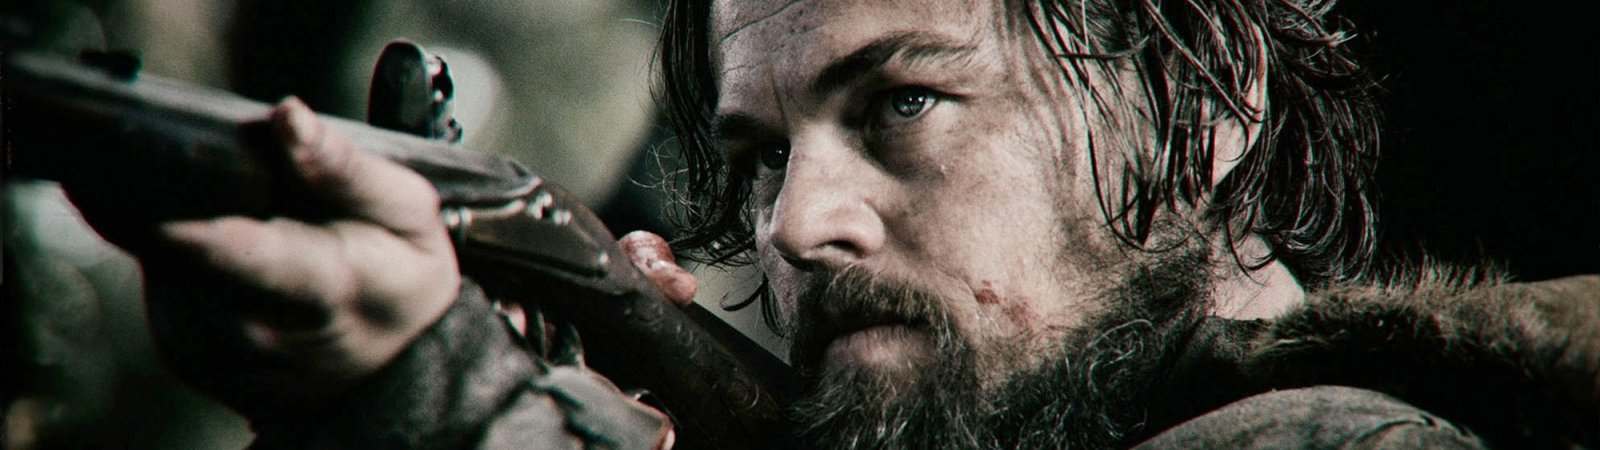 Photo dernier film Alejandro Gonzalez Iñárritu